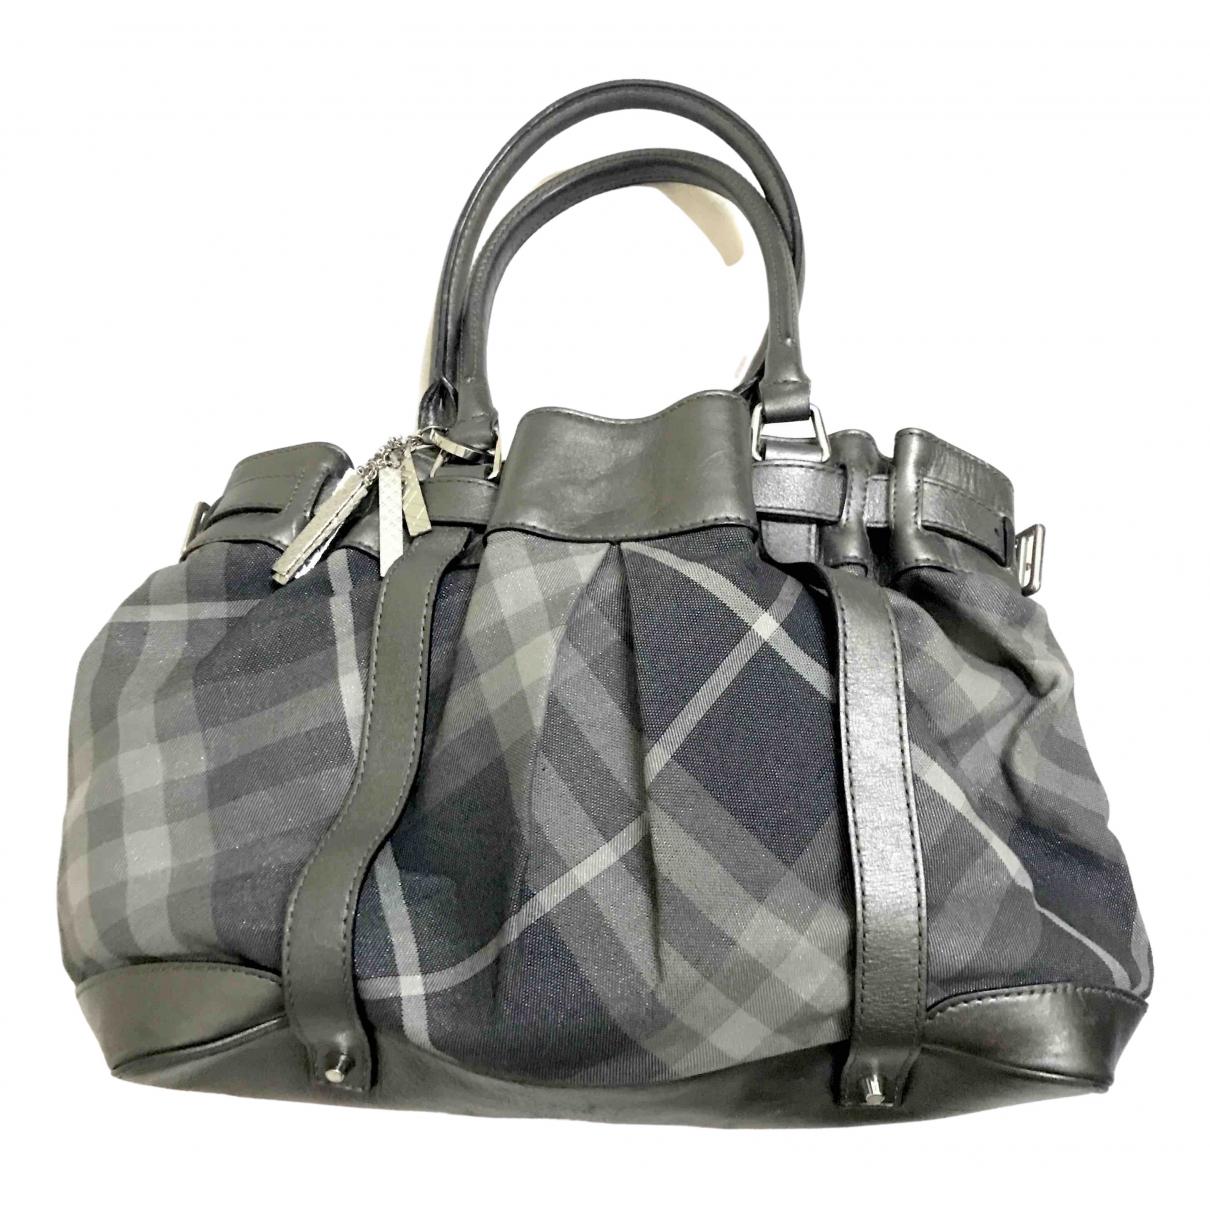 Burberry N Grey Cotton handbag for Women N